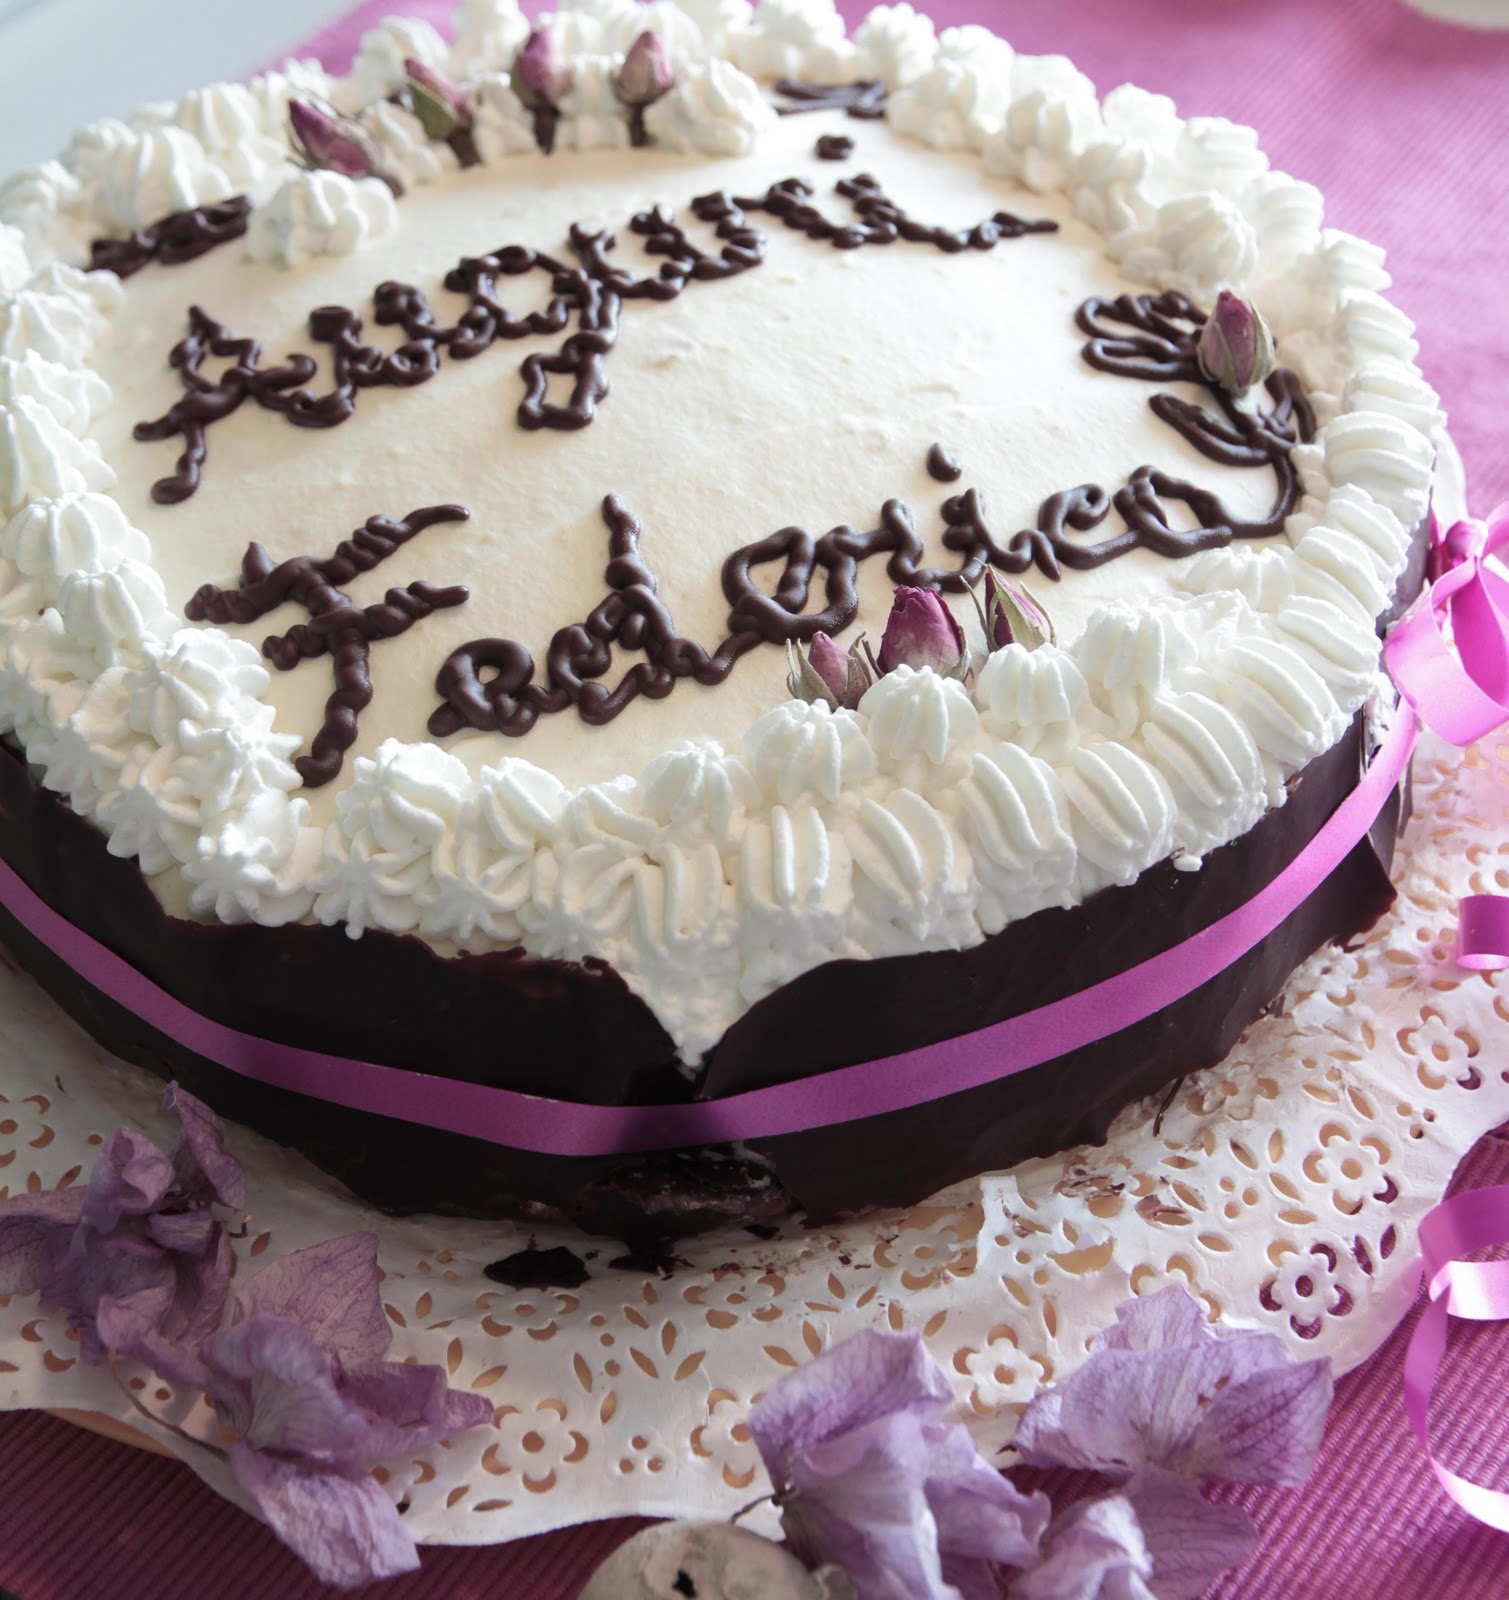 http://dolcelavita-mysweetart.blogspot.it/2011/10/torta-buon-compleanno.html